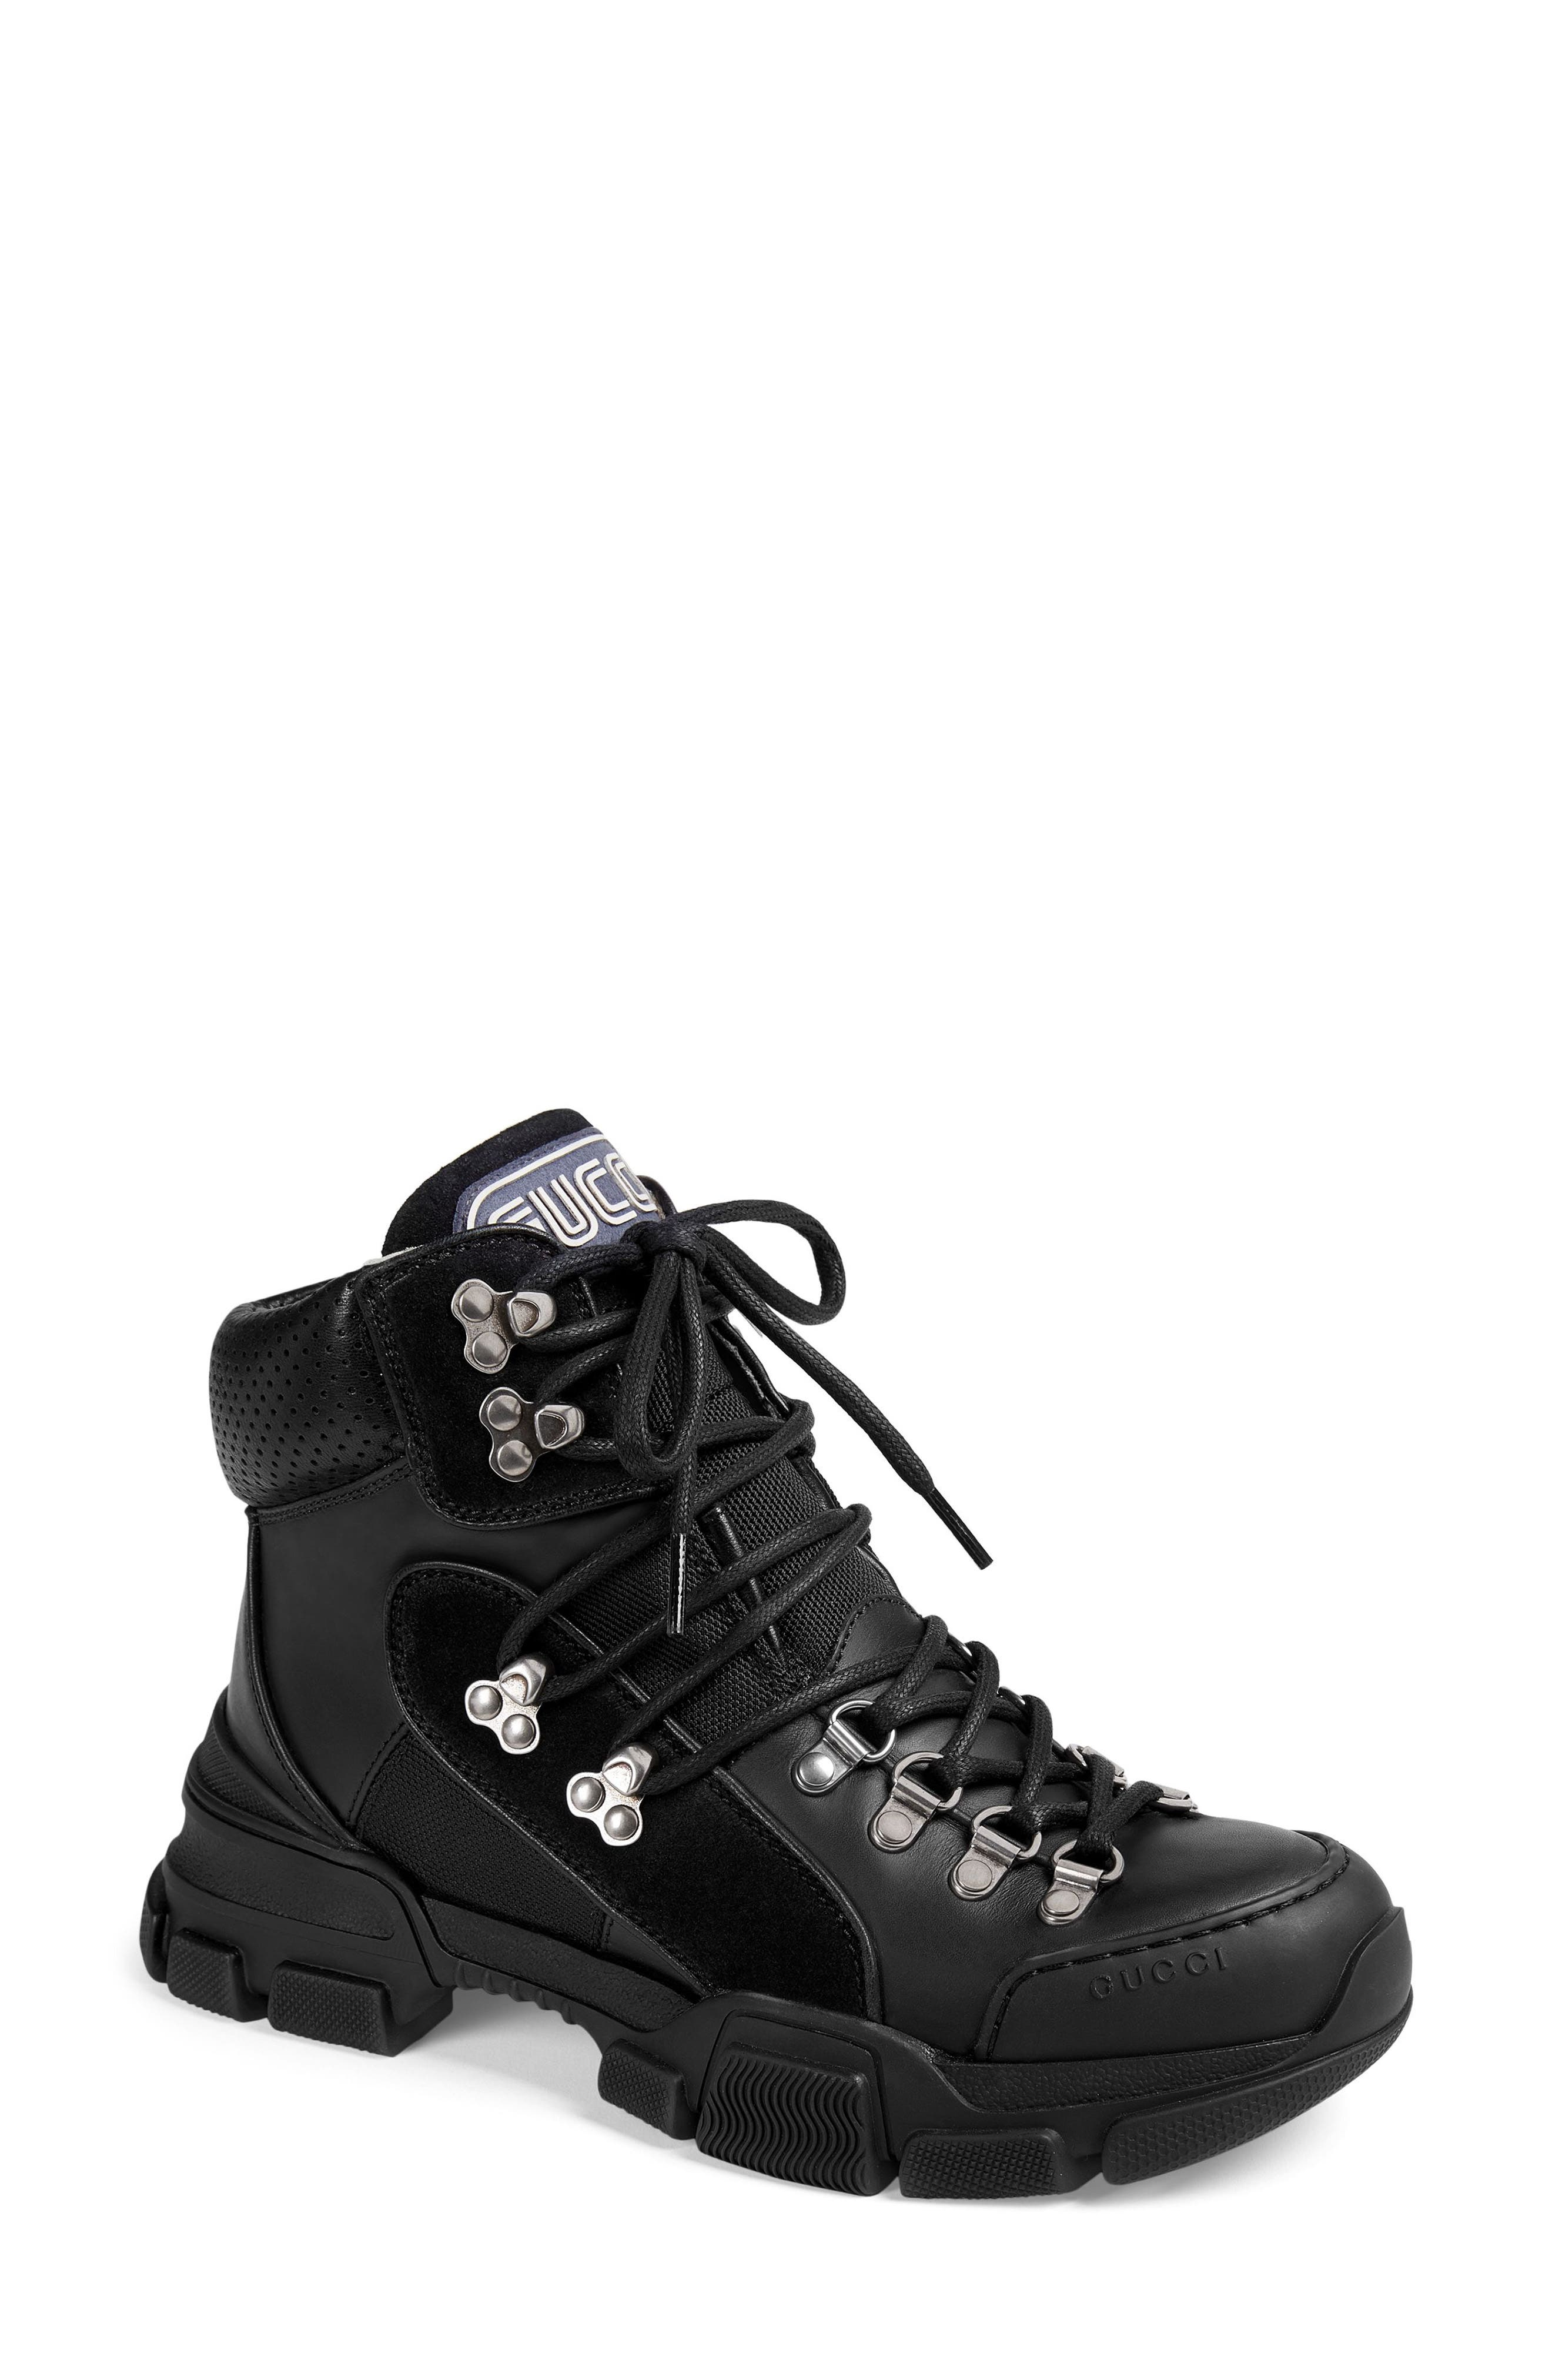 GUCCI, Lace-Up Boot, Main thumbnail 1, color, BLACK